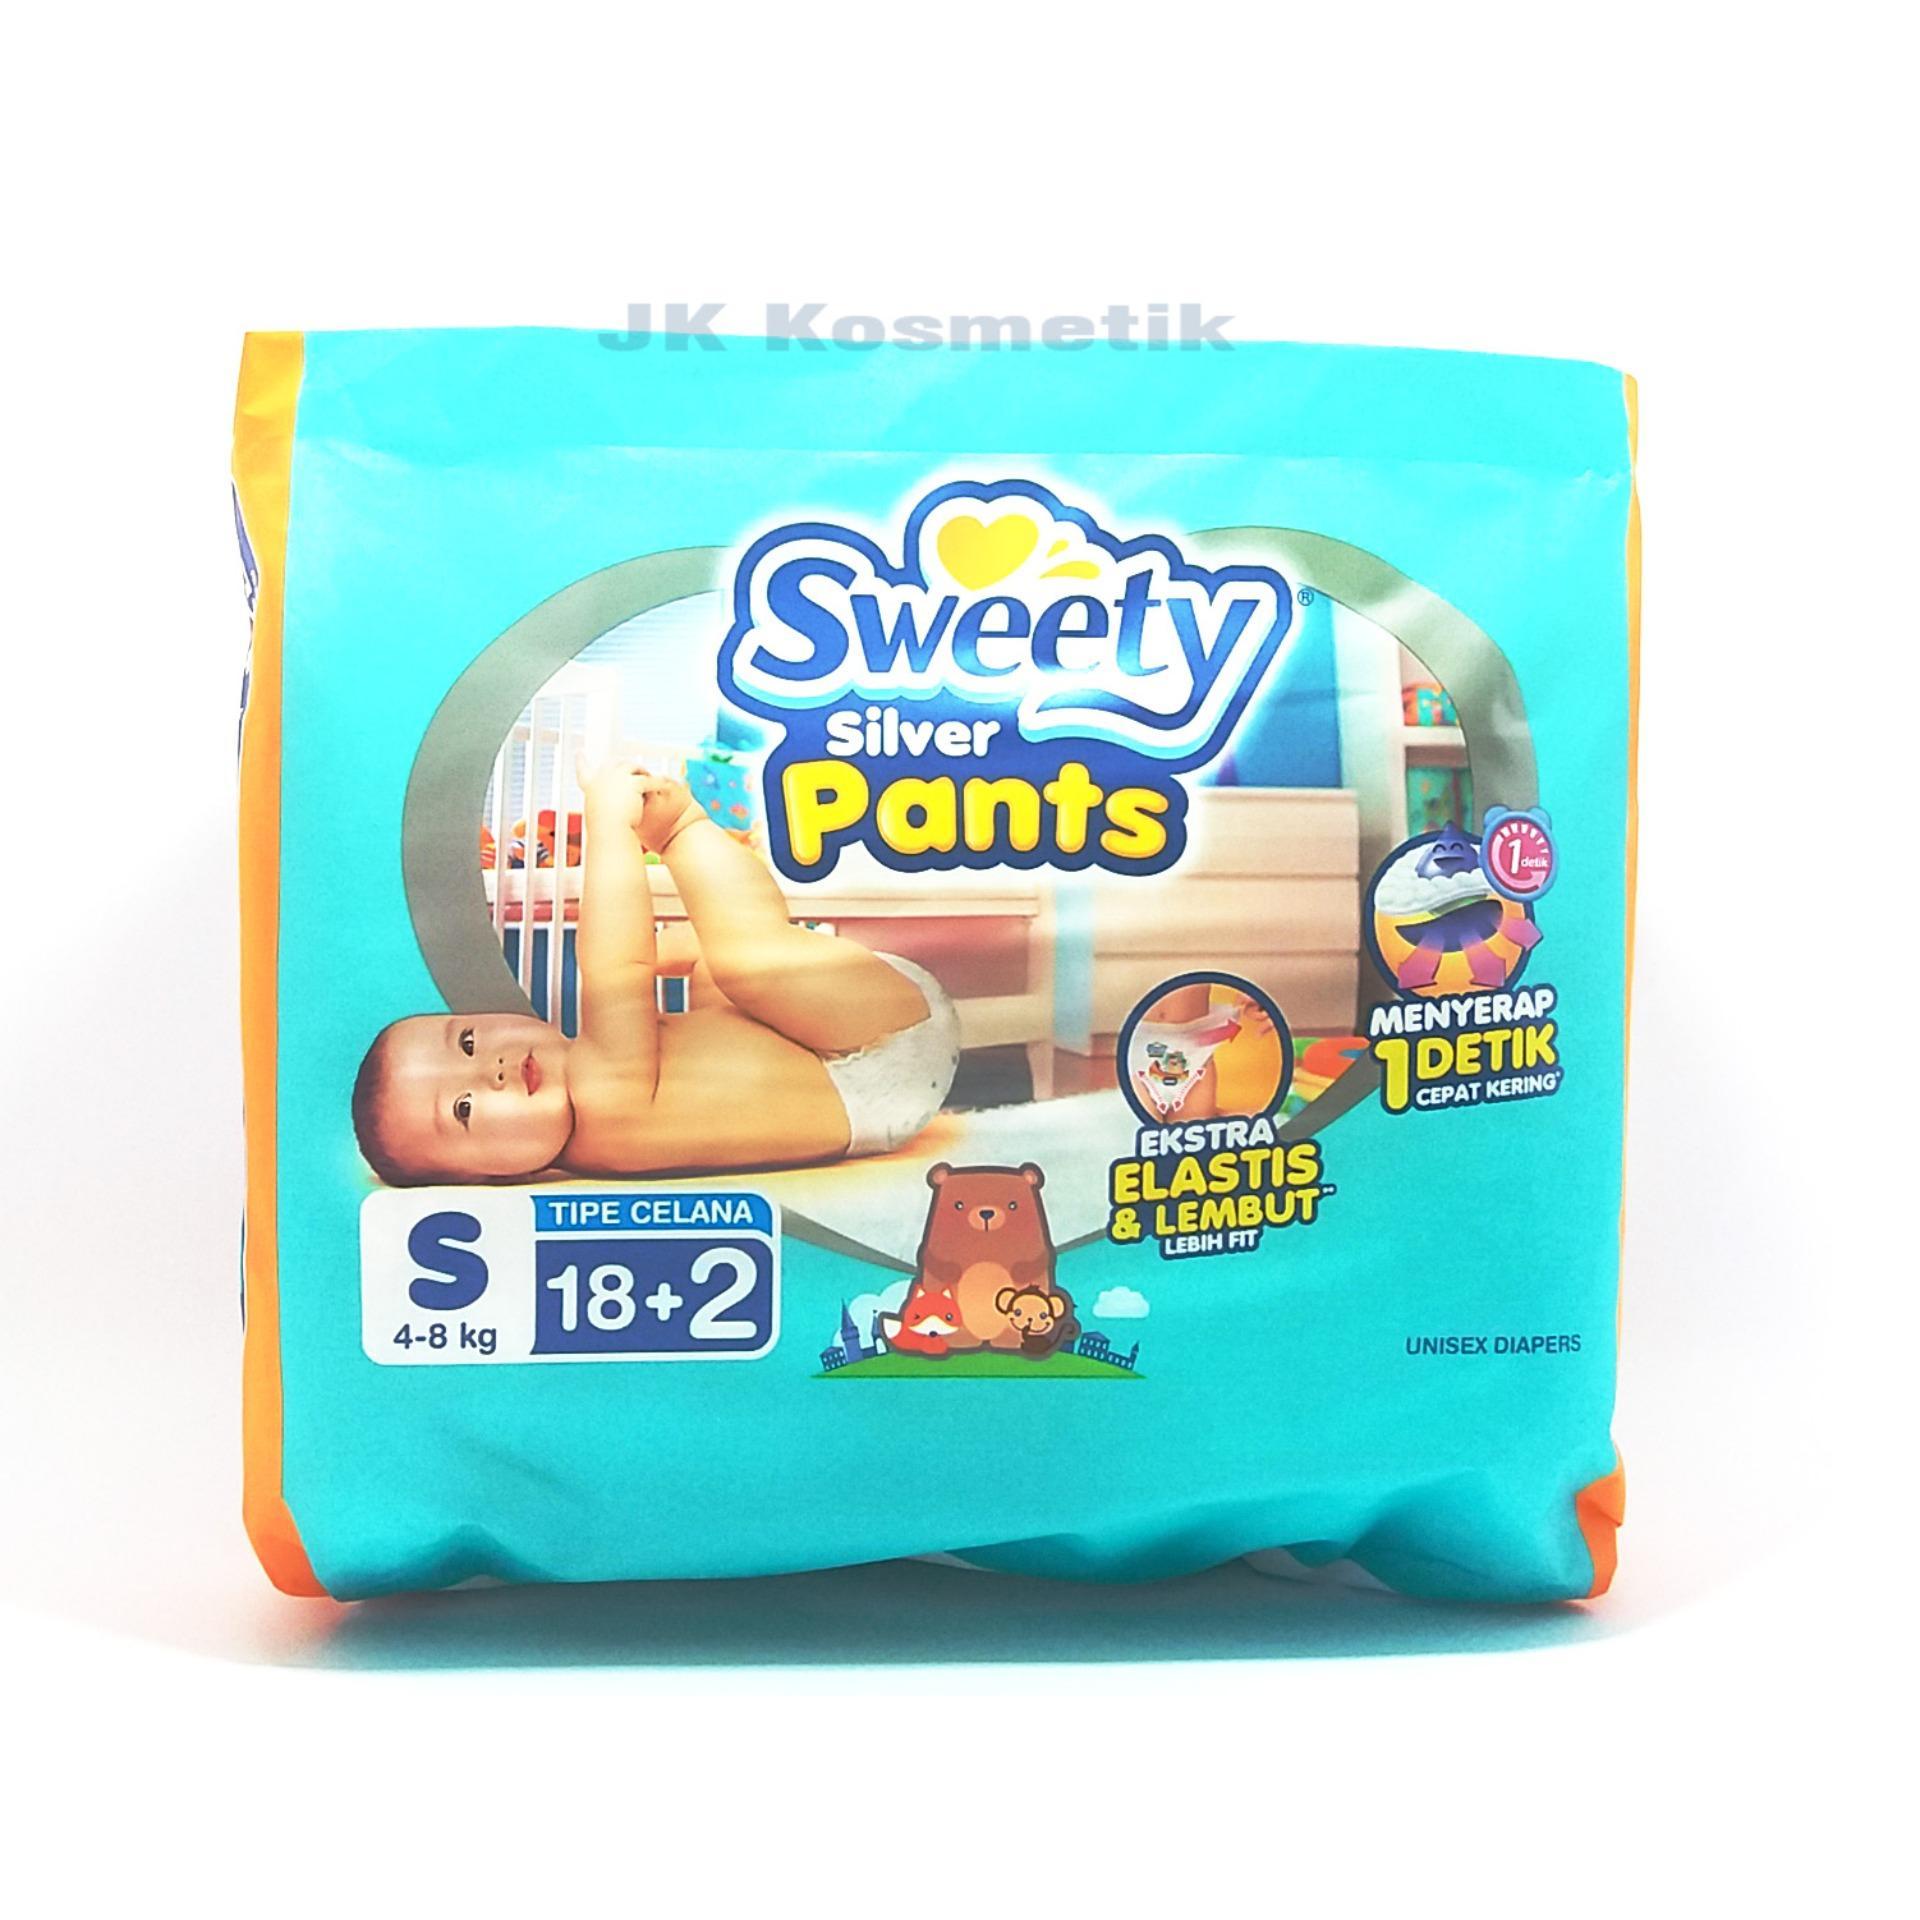 Beli Sweety Silver Pants Popok Bayi Dan Anak Unisex Diapers Tipe Baby Happy Body Fit Size L 30 Pcs Pampers S18